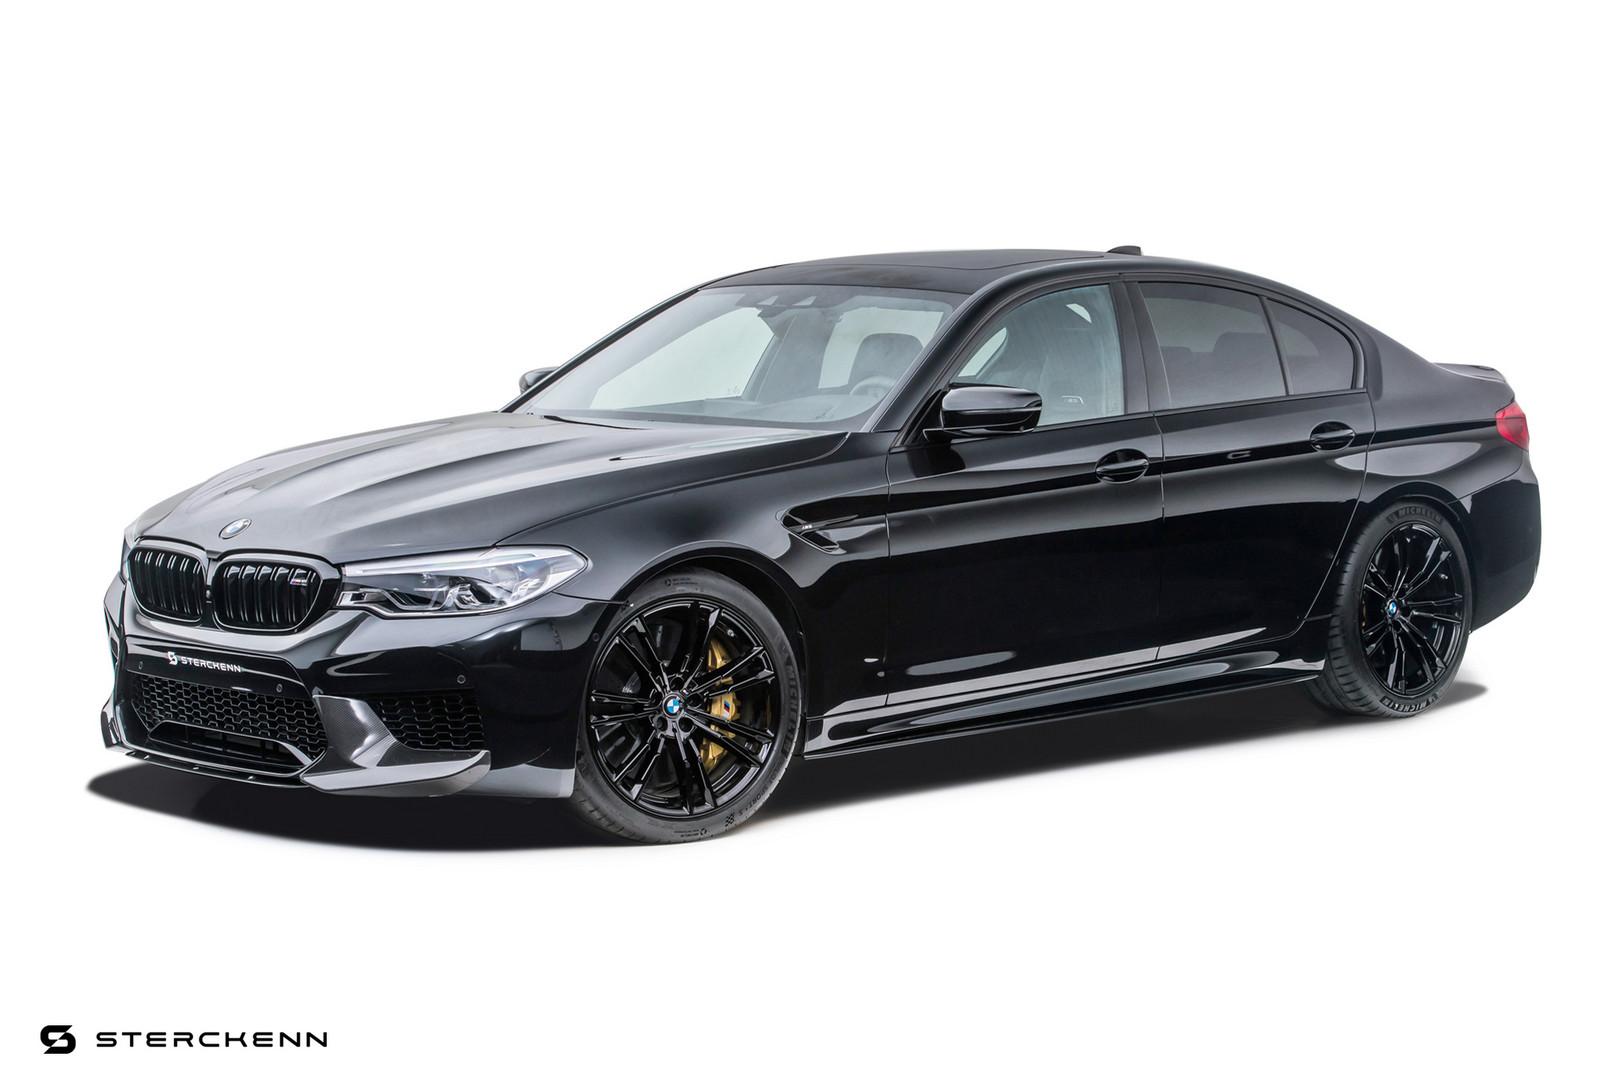 BMW-M5-Side-View